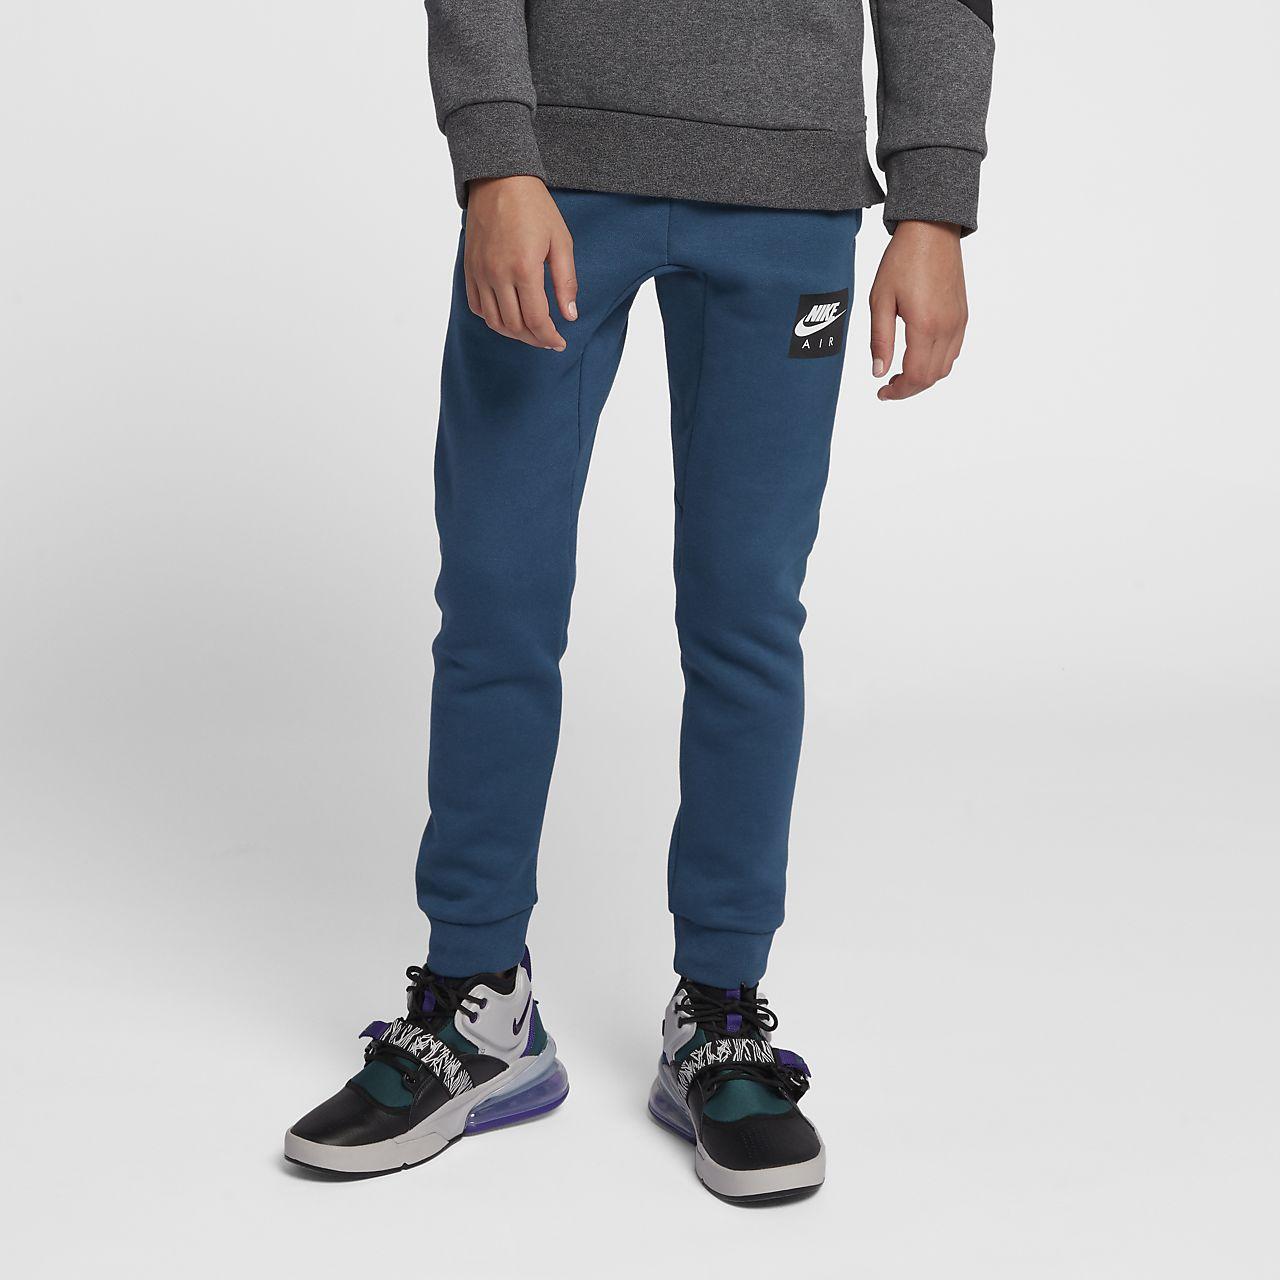 9c5238a4840b59 Nike Air Big Kids  (Boys ) Pants. Nike.com